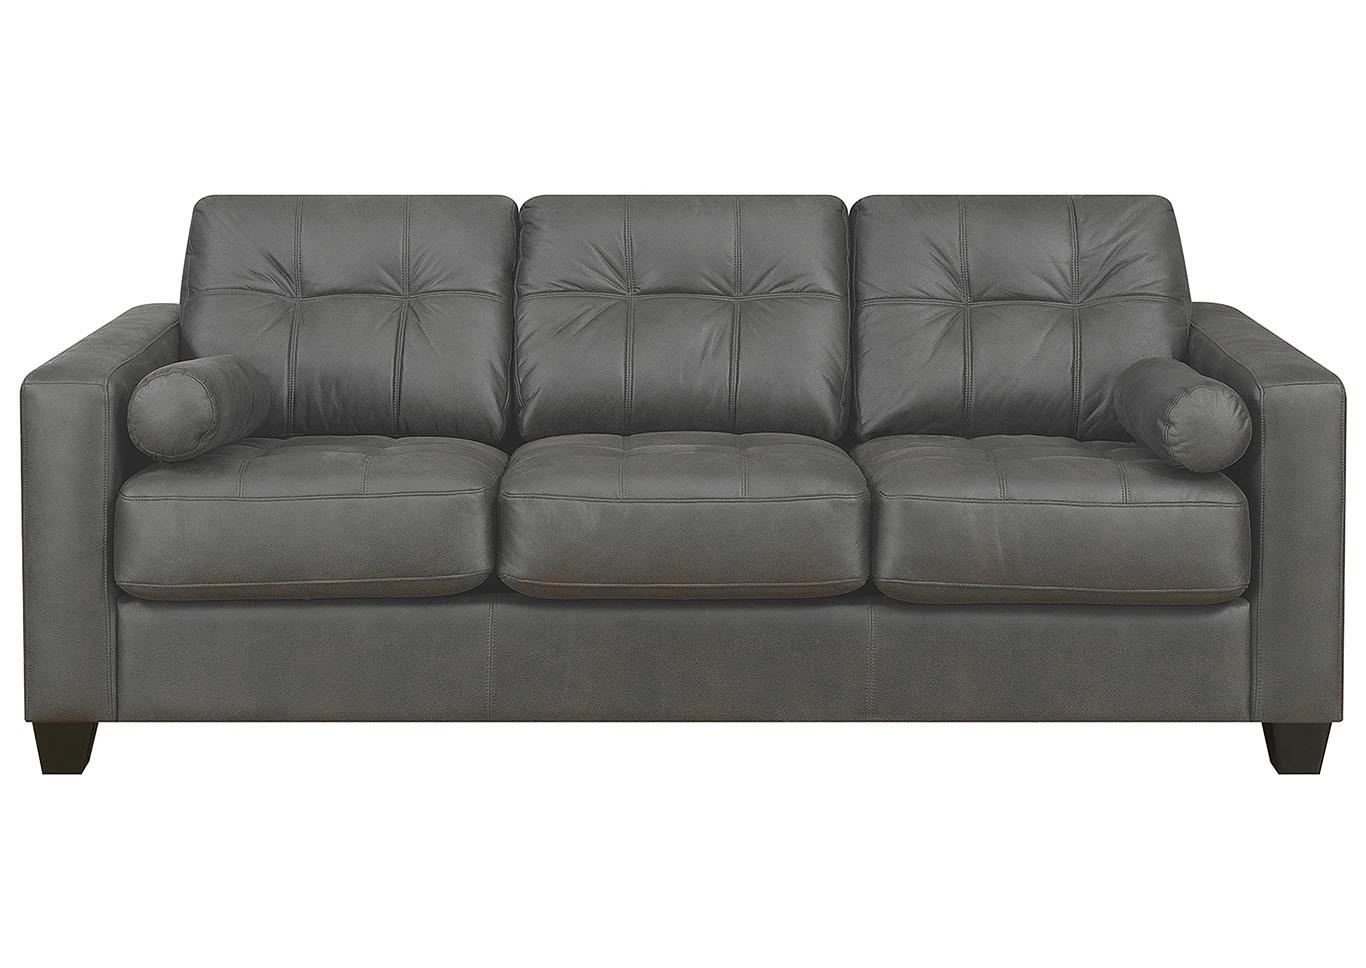 Miraculous Taba Home Furnishings Kara Gray Stationary Sofa Machost Co Dining Chair Design Ideas Machostcouk